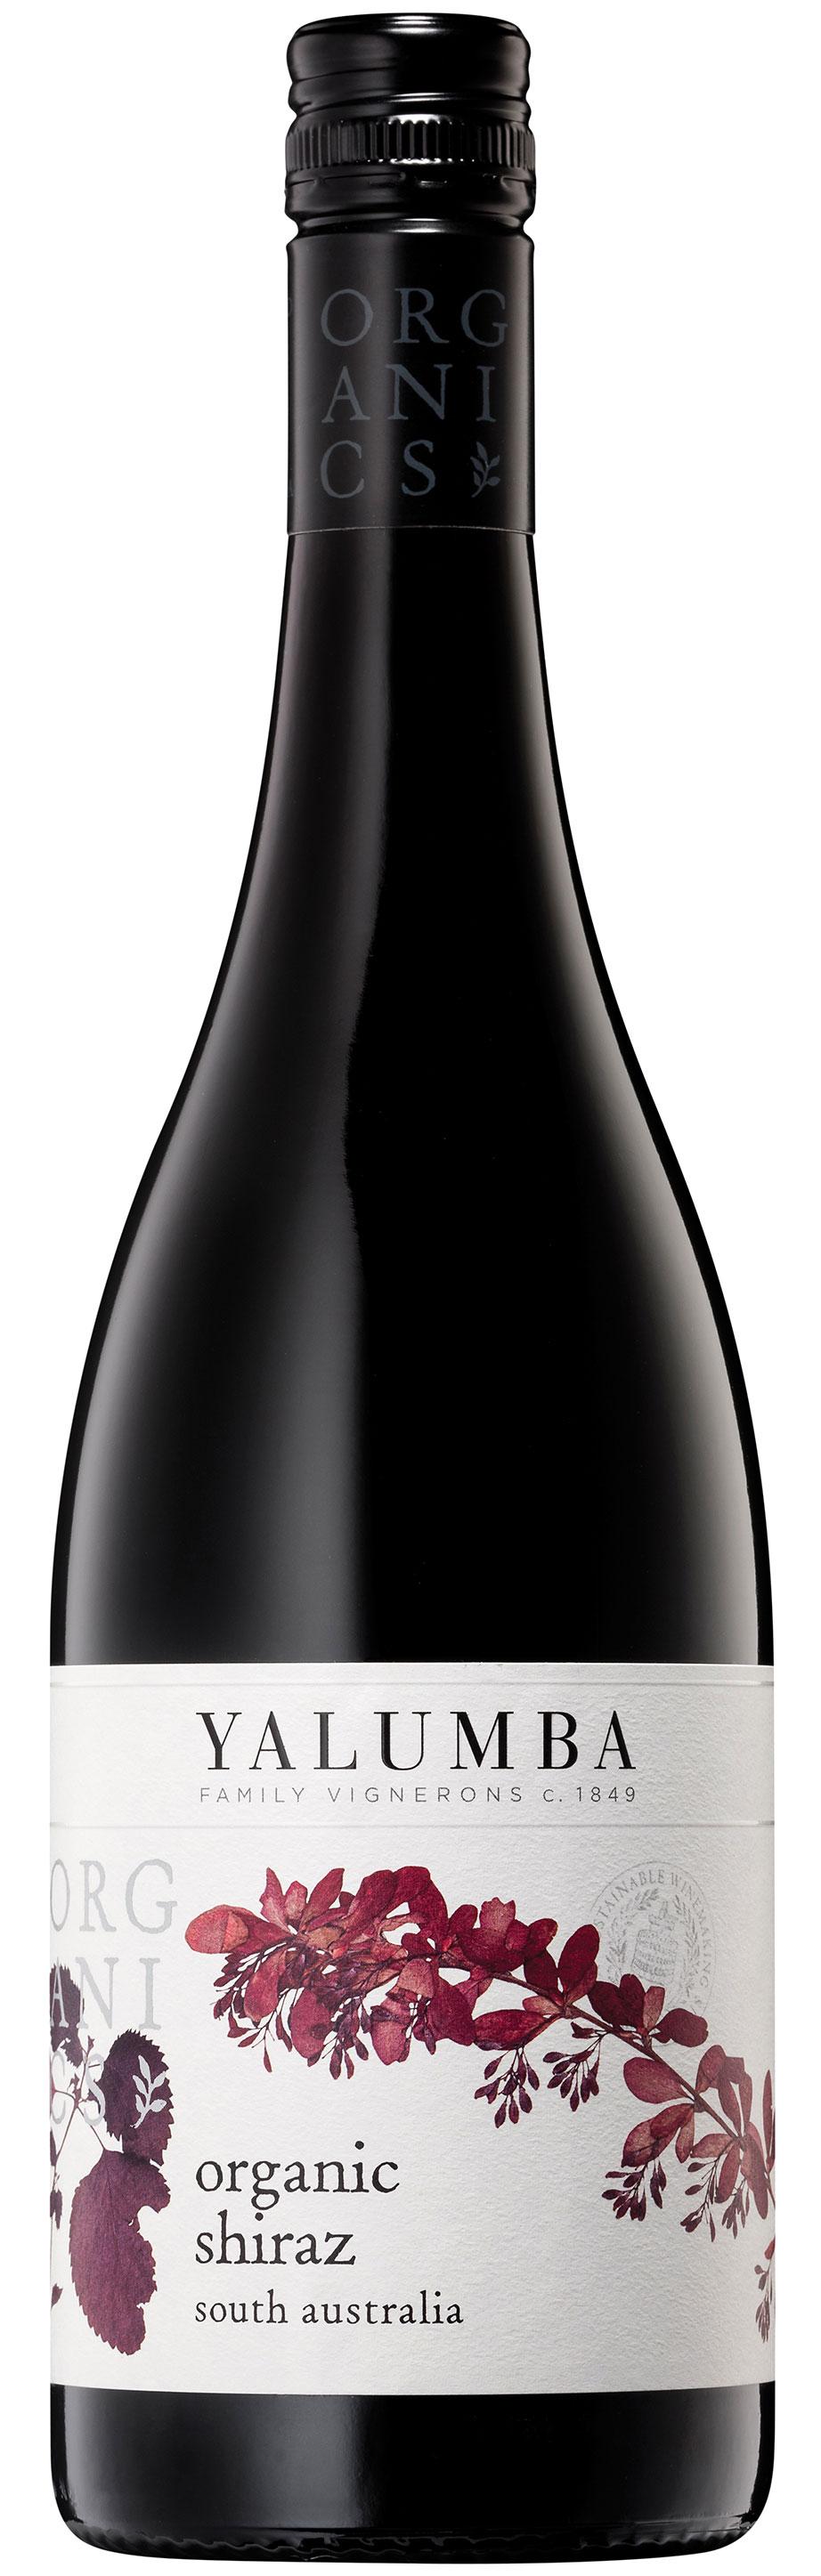 https://vinocorpperu.com/images/vinos/yalumba/organic_shiraz_2017.jpg